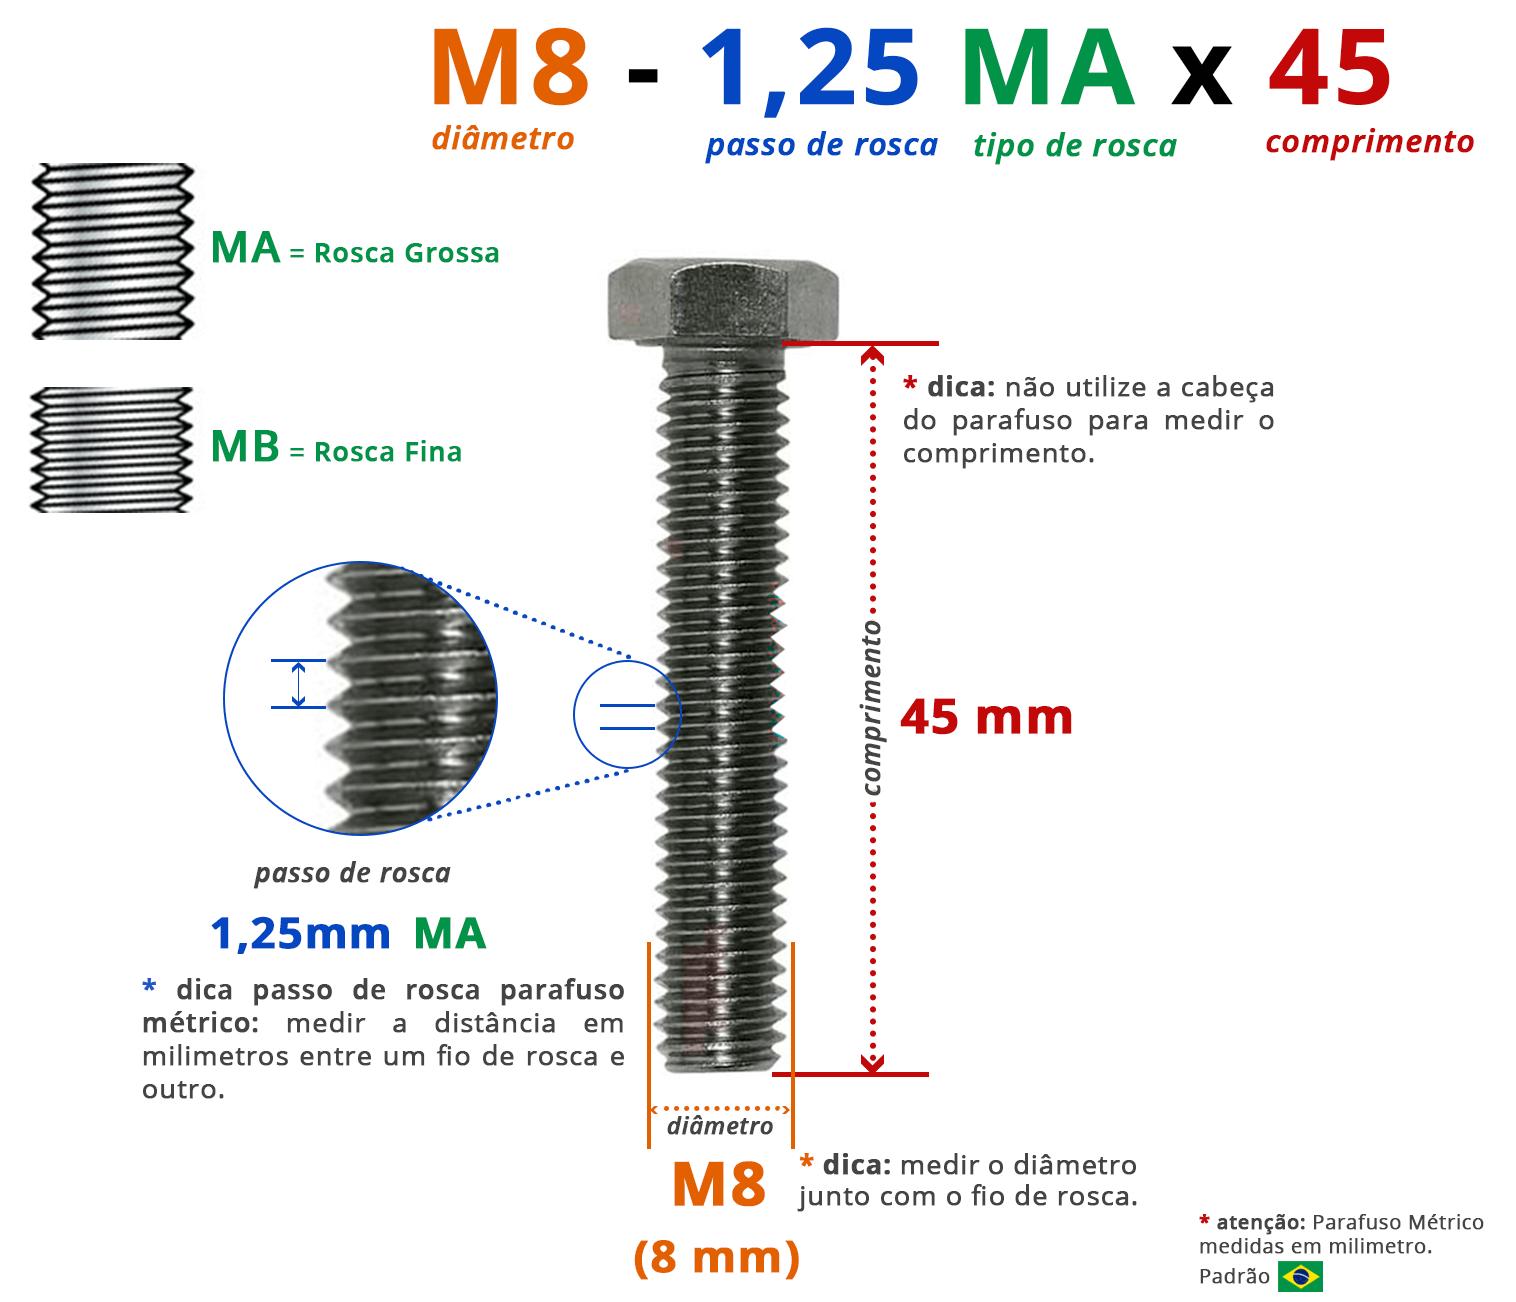 PARAFUSO SEXTAVADO ROSCA INTEIRA M8 1,25 MA X 45 DIN 933 INOX A4